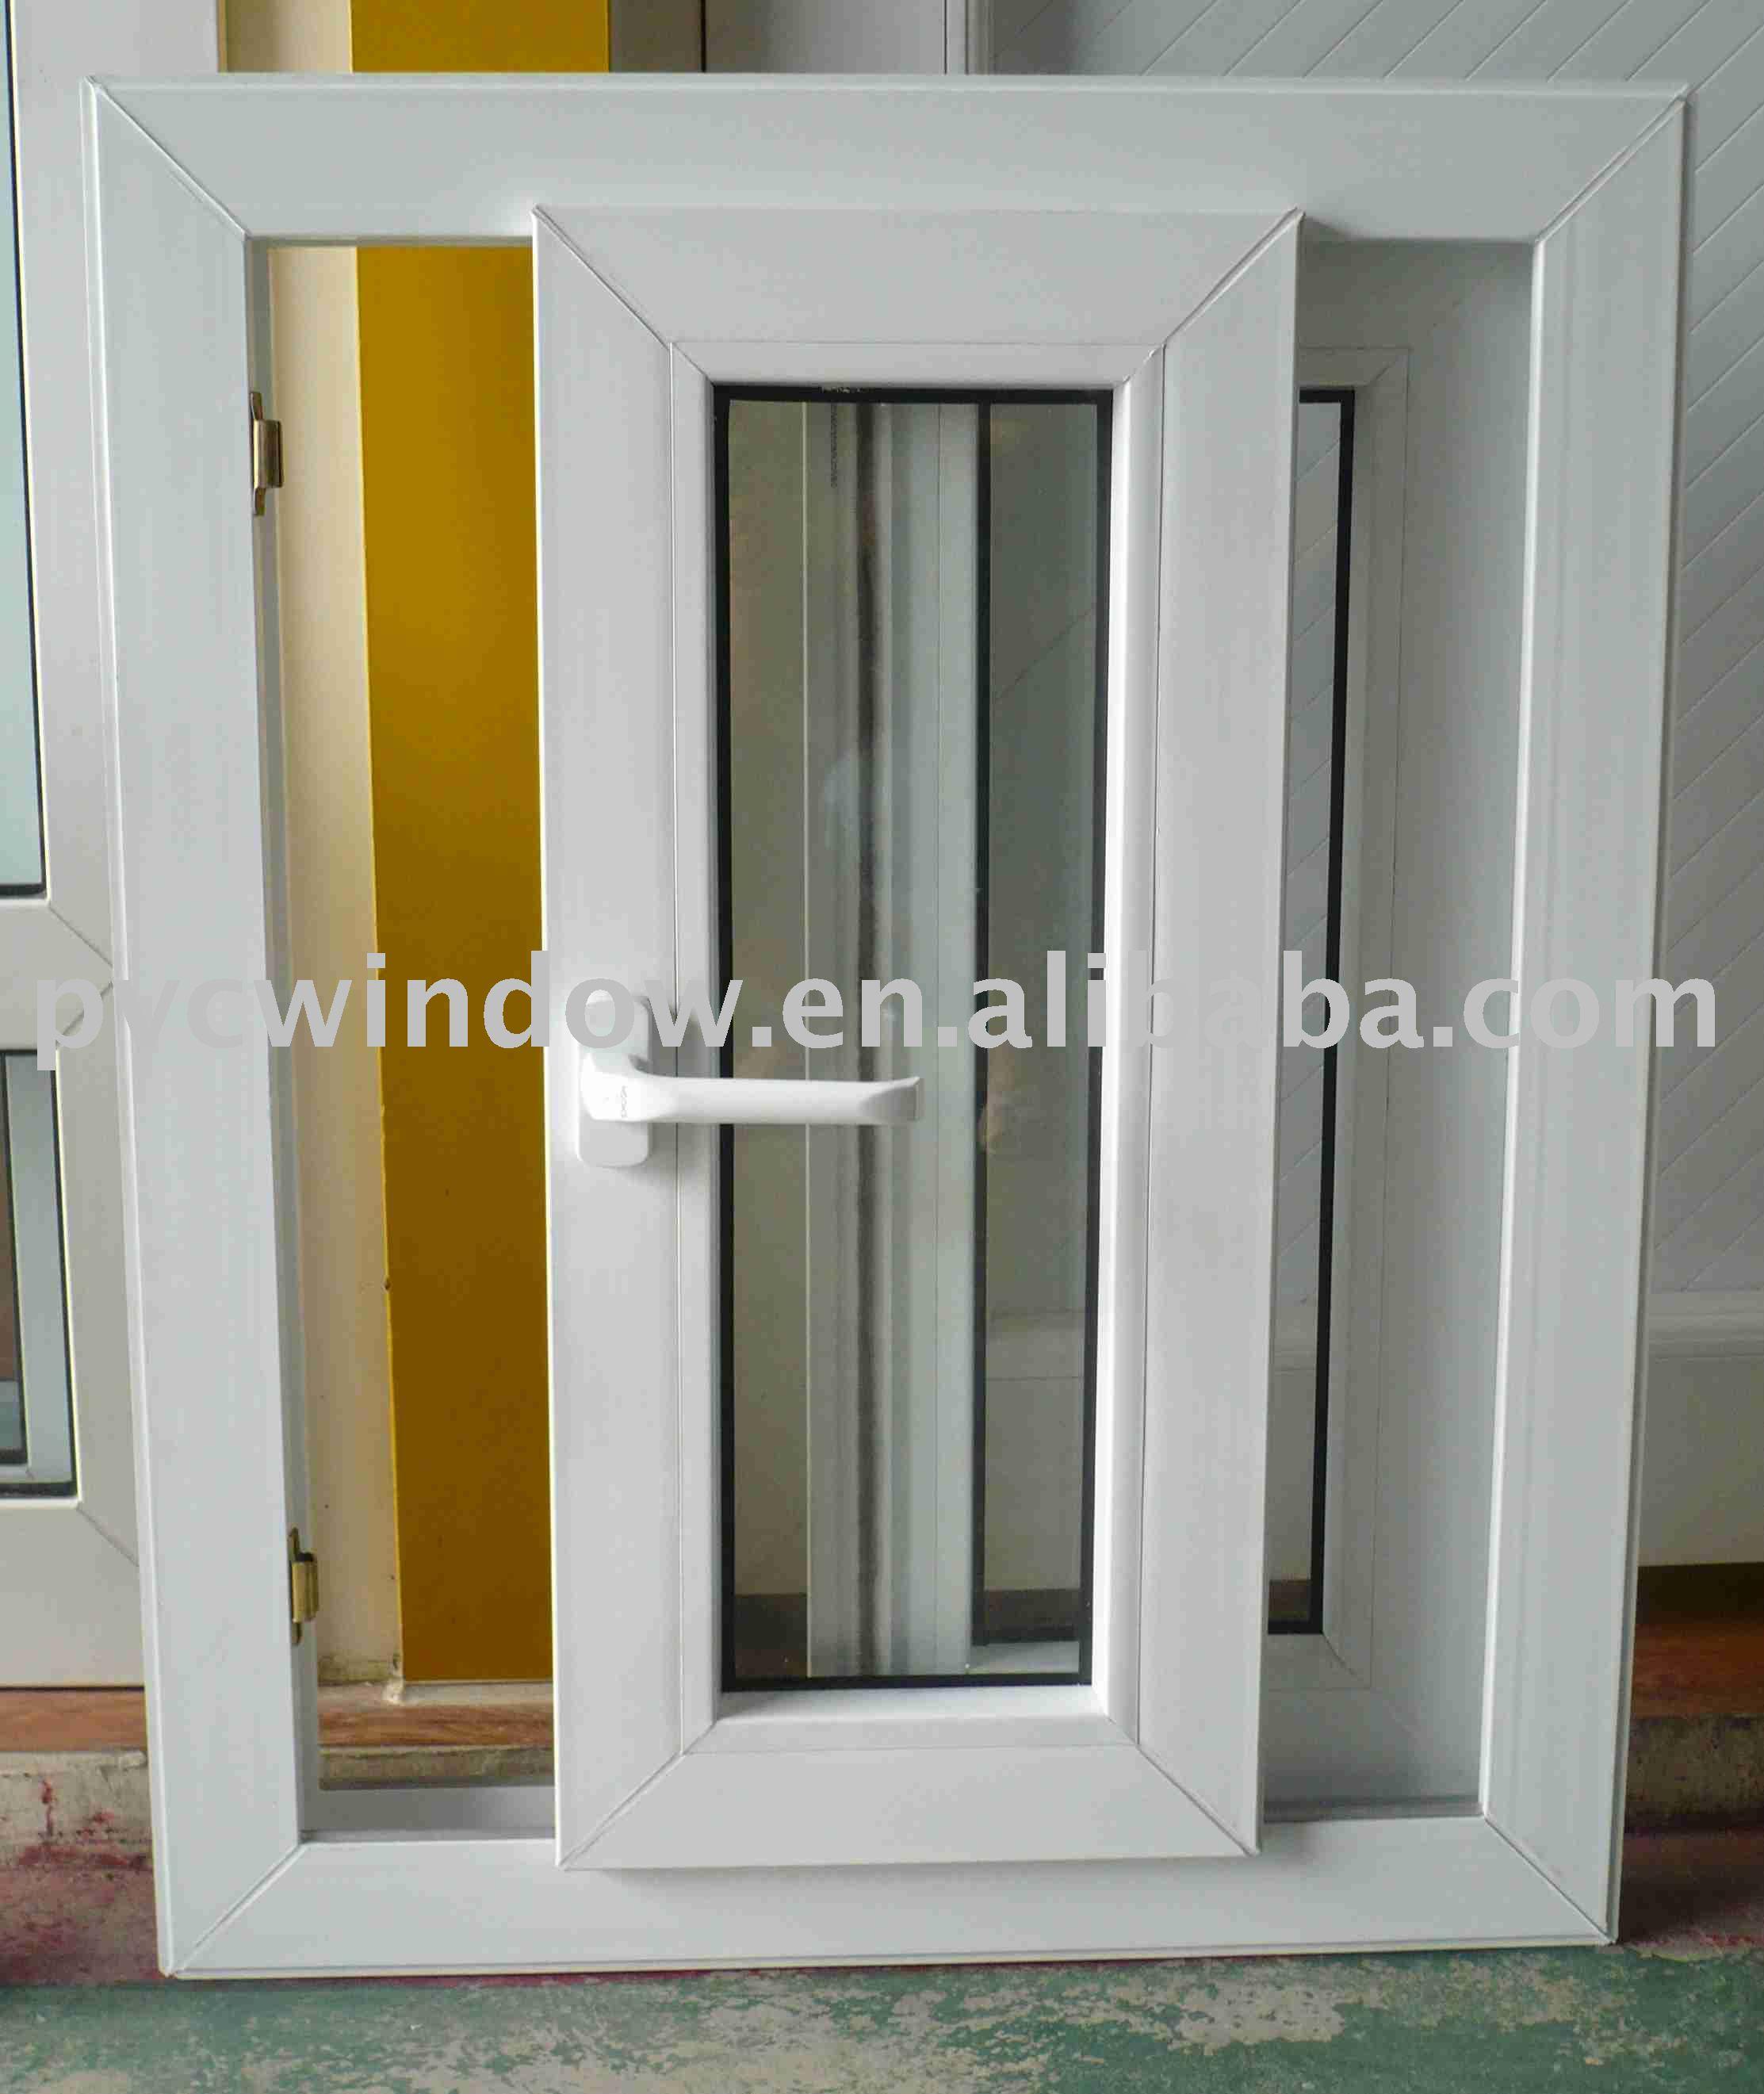 Verified Supplier Guangzhou Haodi Window and Door Co. Ltd. #724C11